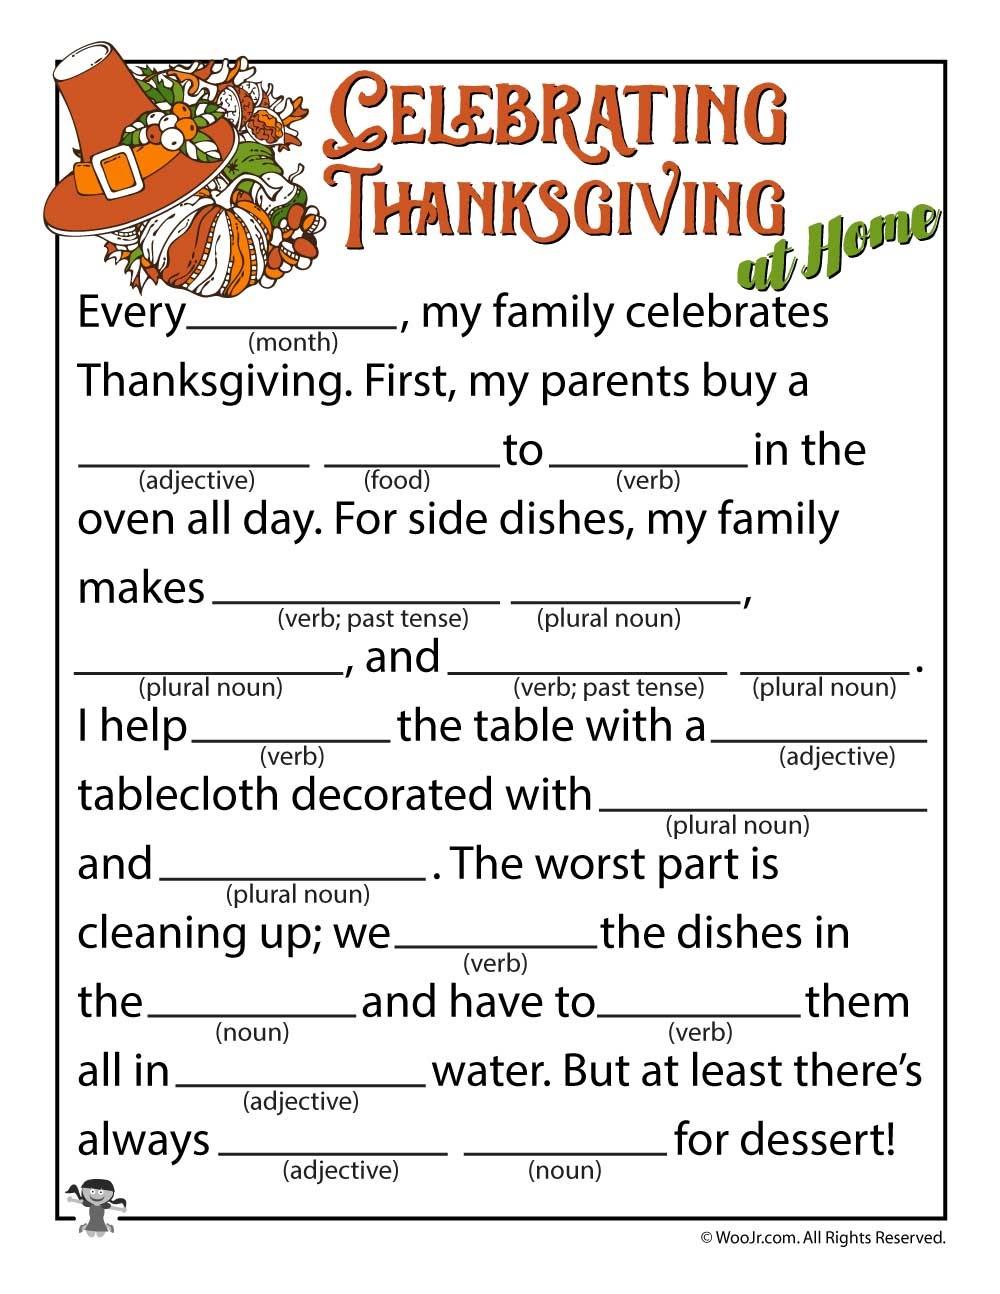 Celebrating Thanksgiving Mad Lib | Woo! Jr. Kids Activities - Free Printable Thanksgiving Mad Libs